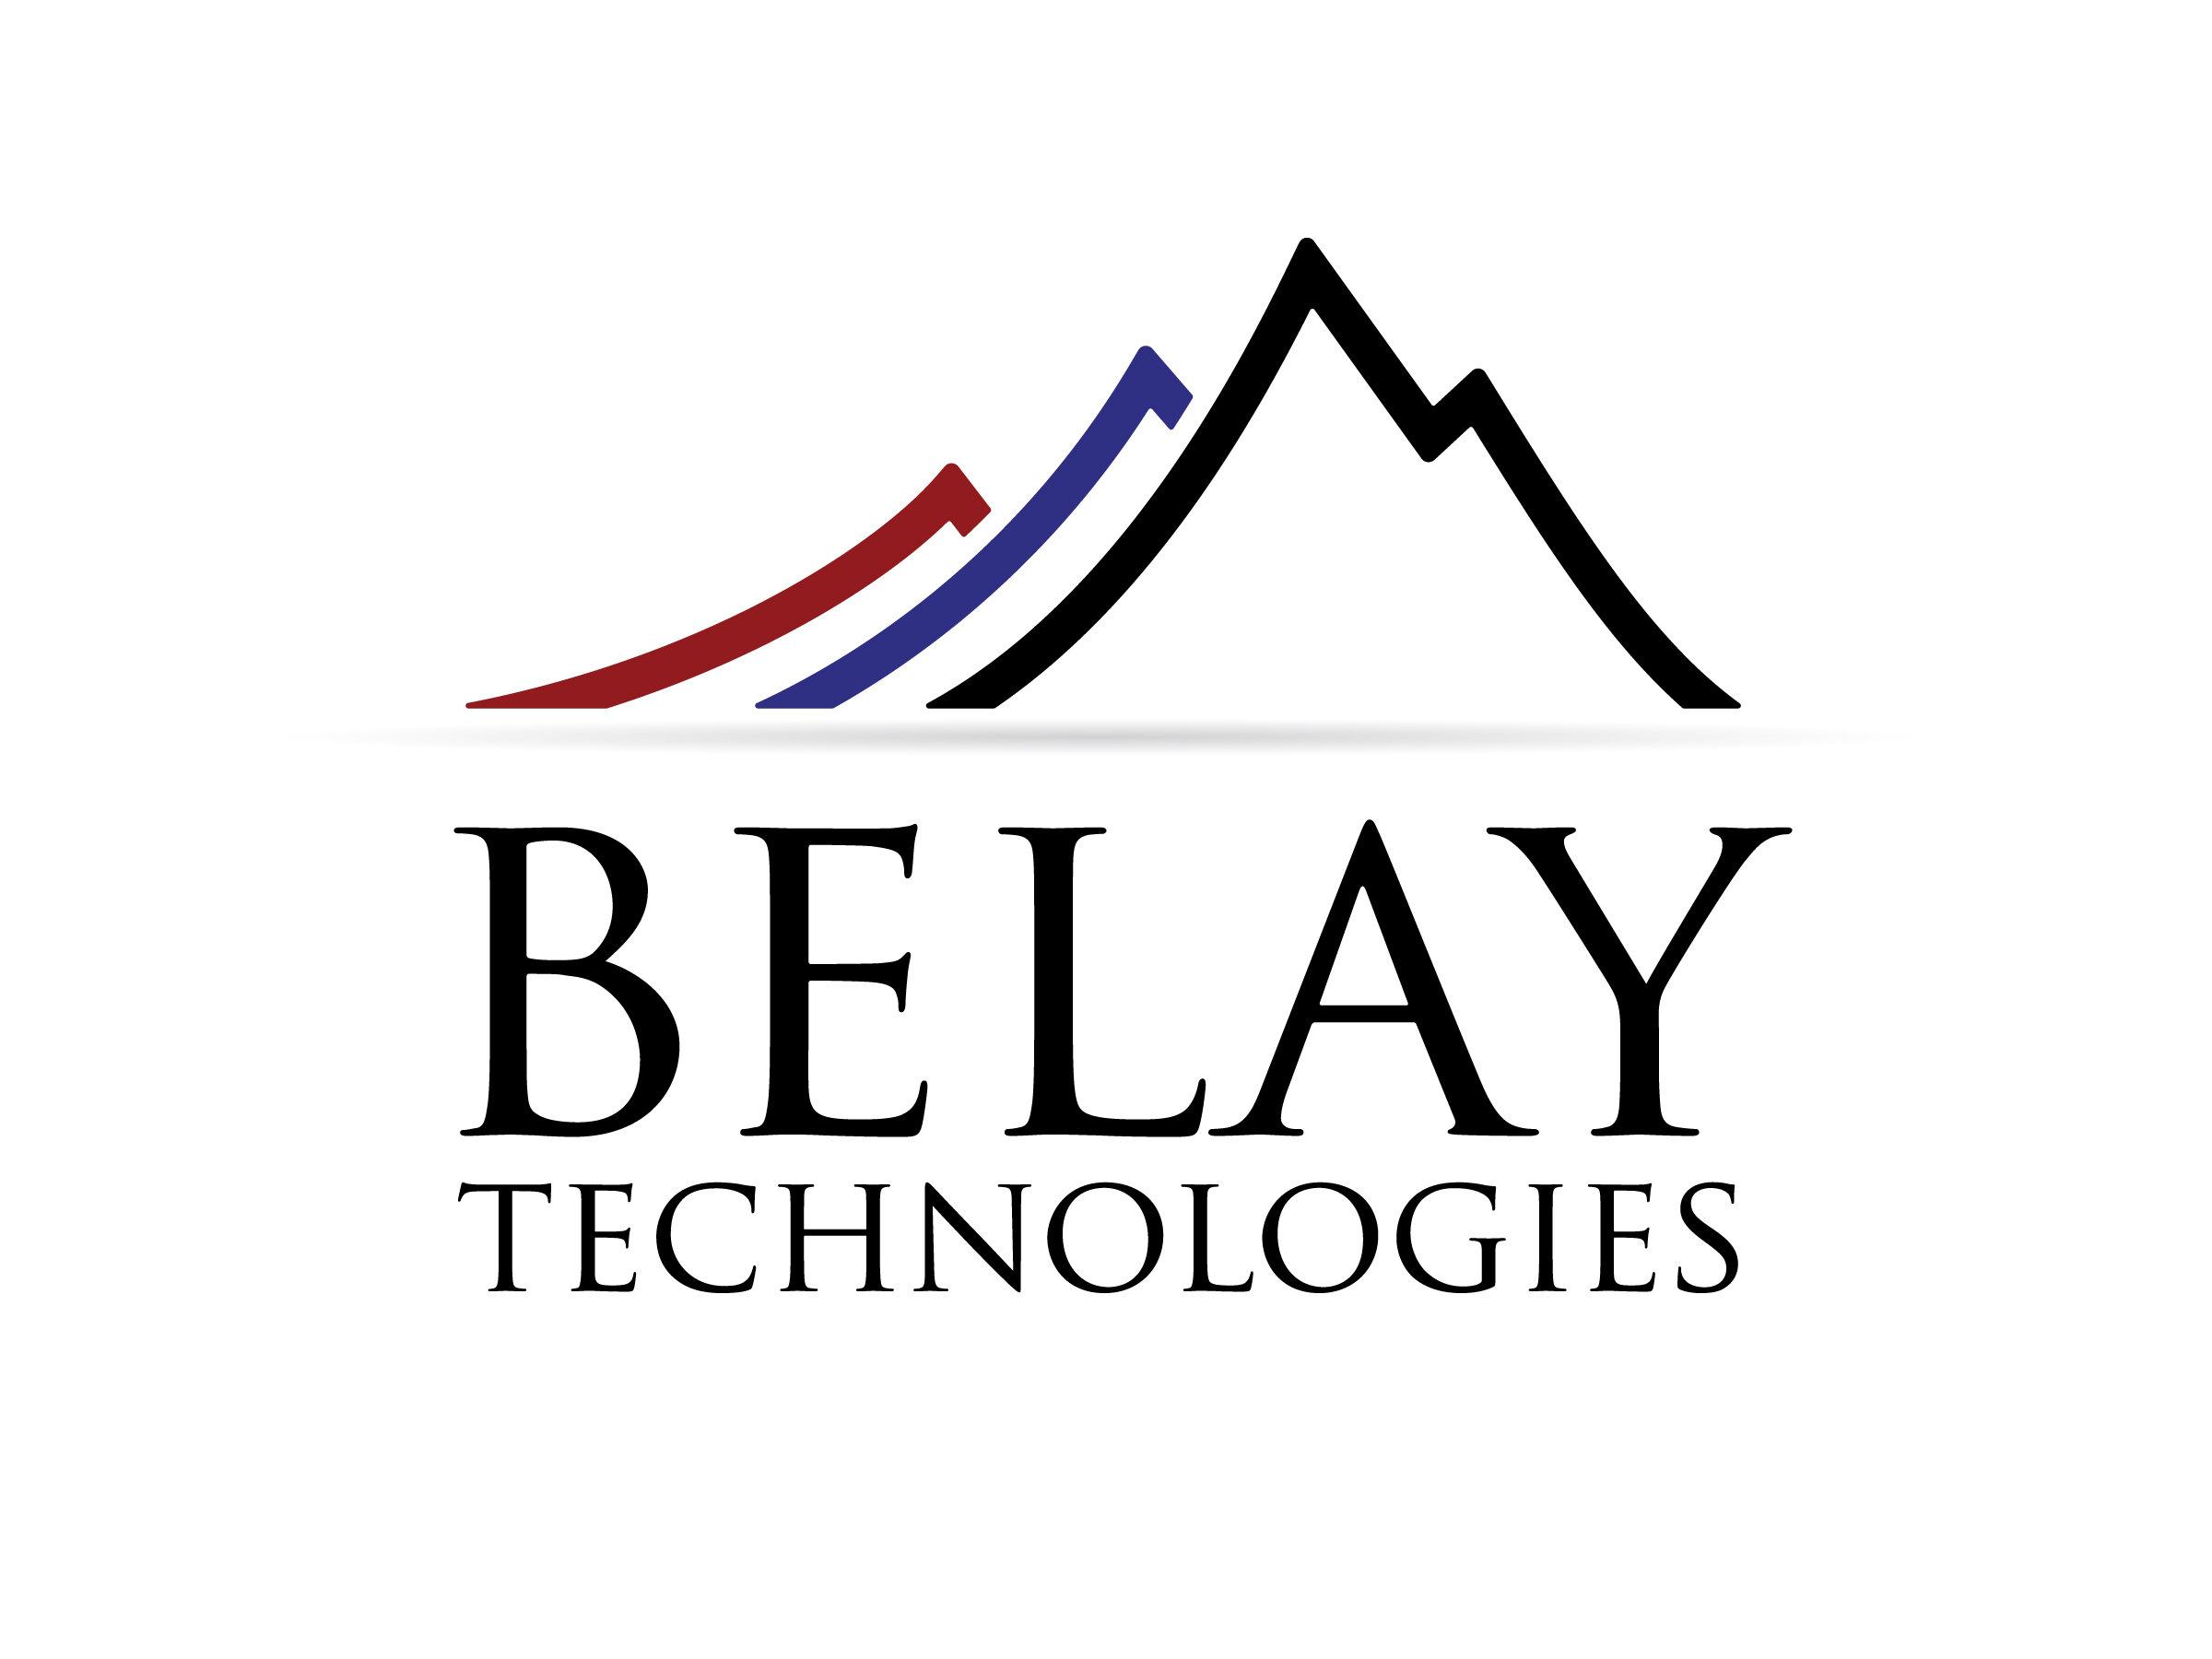 Belay Technologies